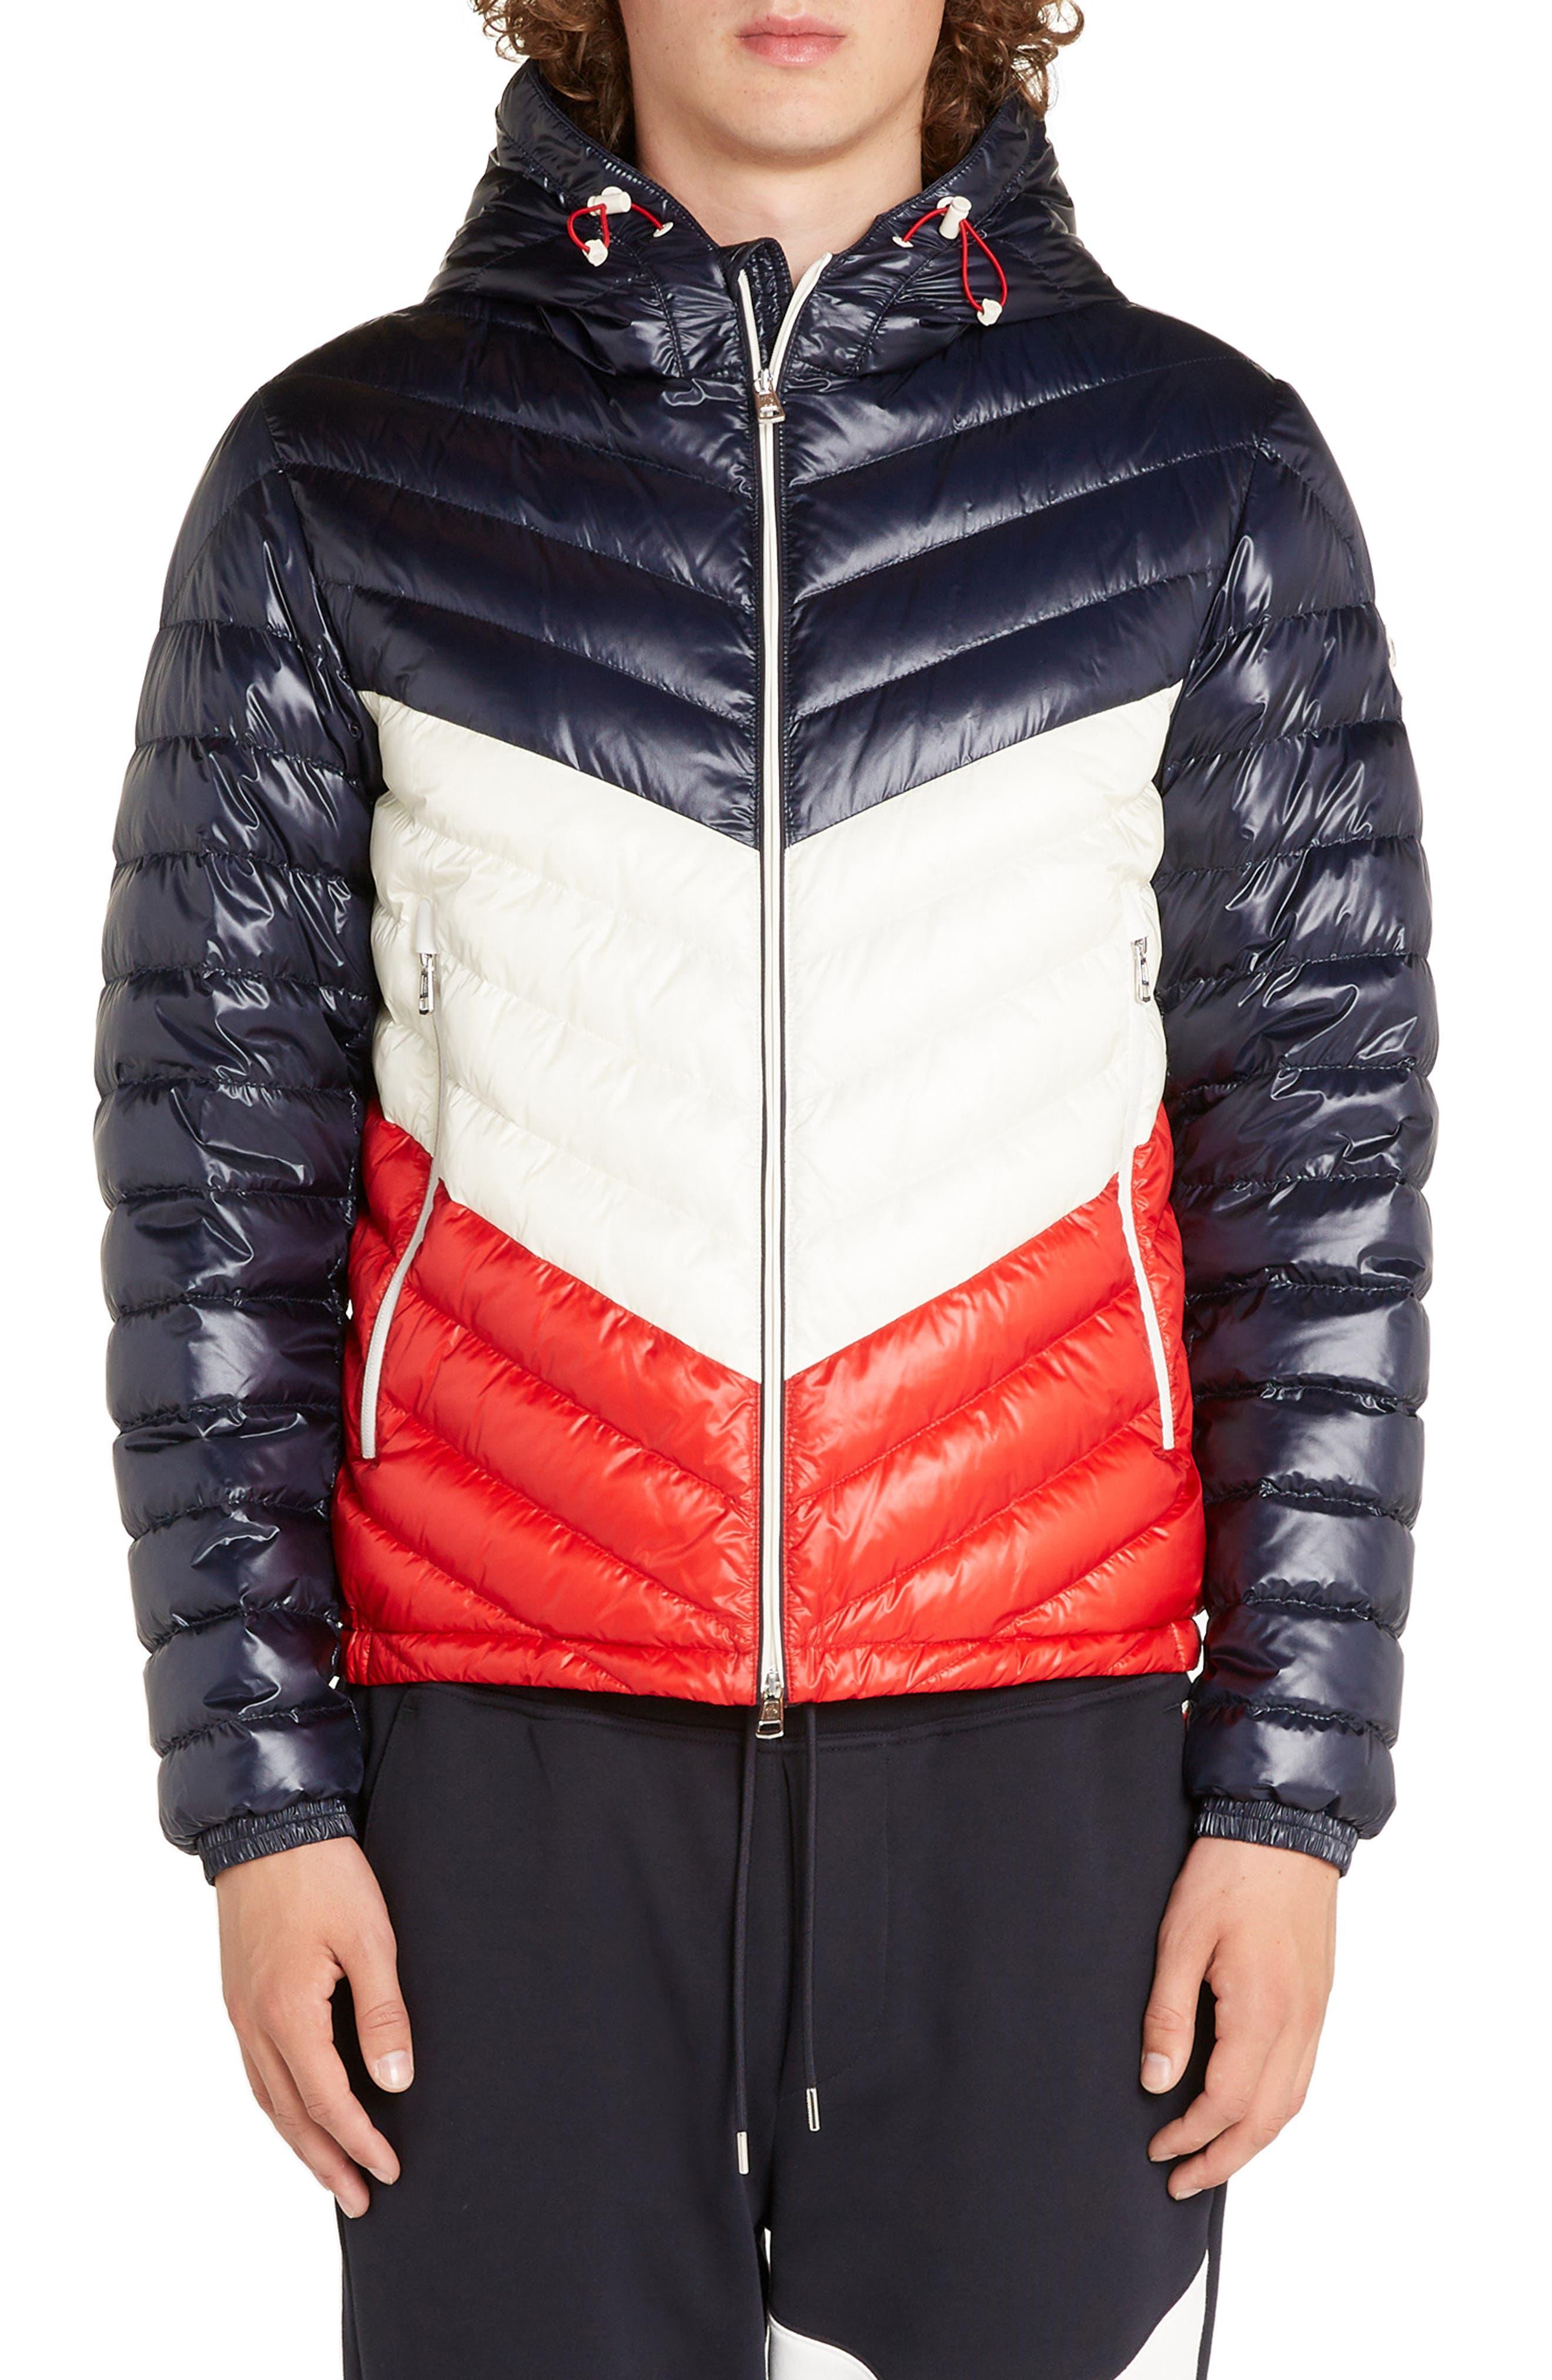 Palliser Colorblock Hooded Jacket,                         Main,                         color, BLUE